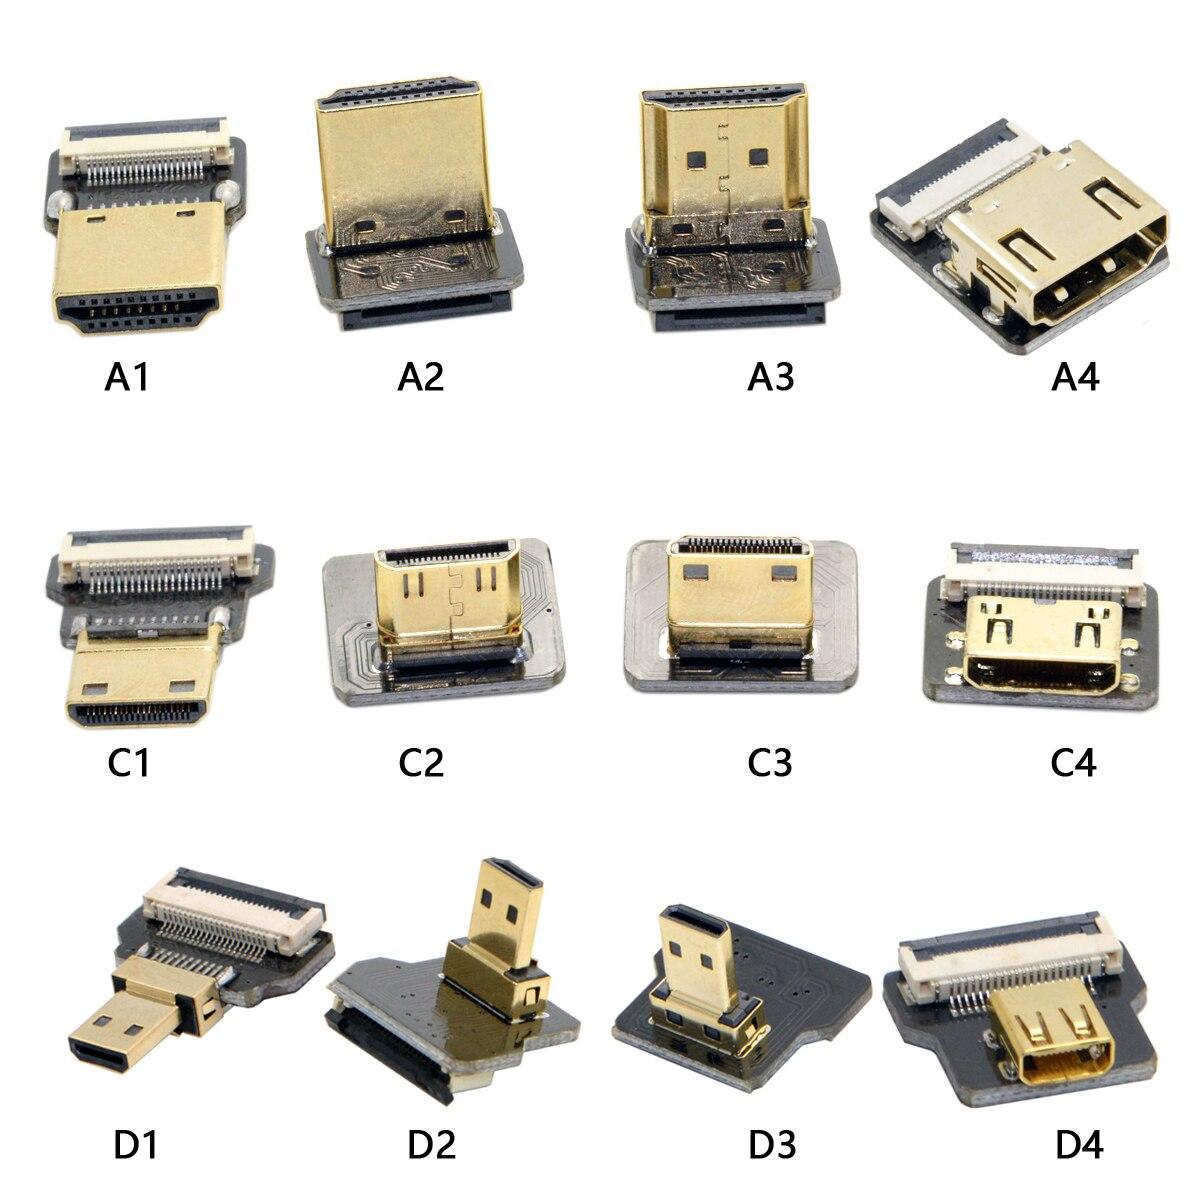 Permanent FFC HDMI FPC HDMI FPV HDMI Cable Standard Full Normal HDMI Male Interface to Standard Full Size HDMI Male Interface for RED BMCC FS7 C300 TV STD Raspberry pi Black 60CM